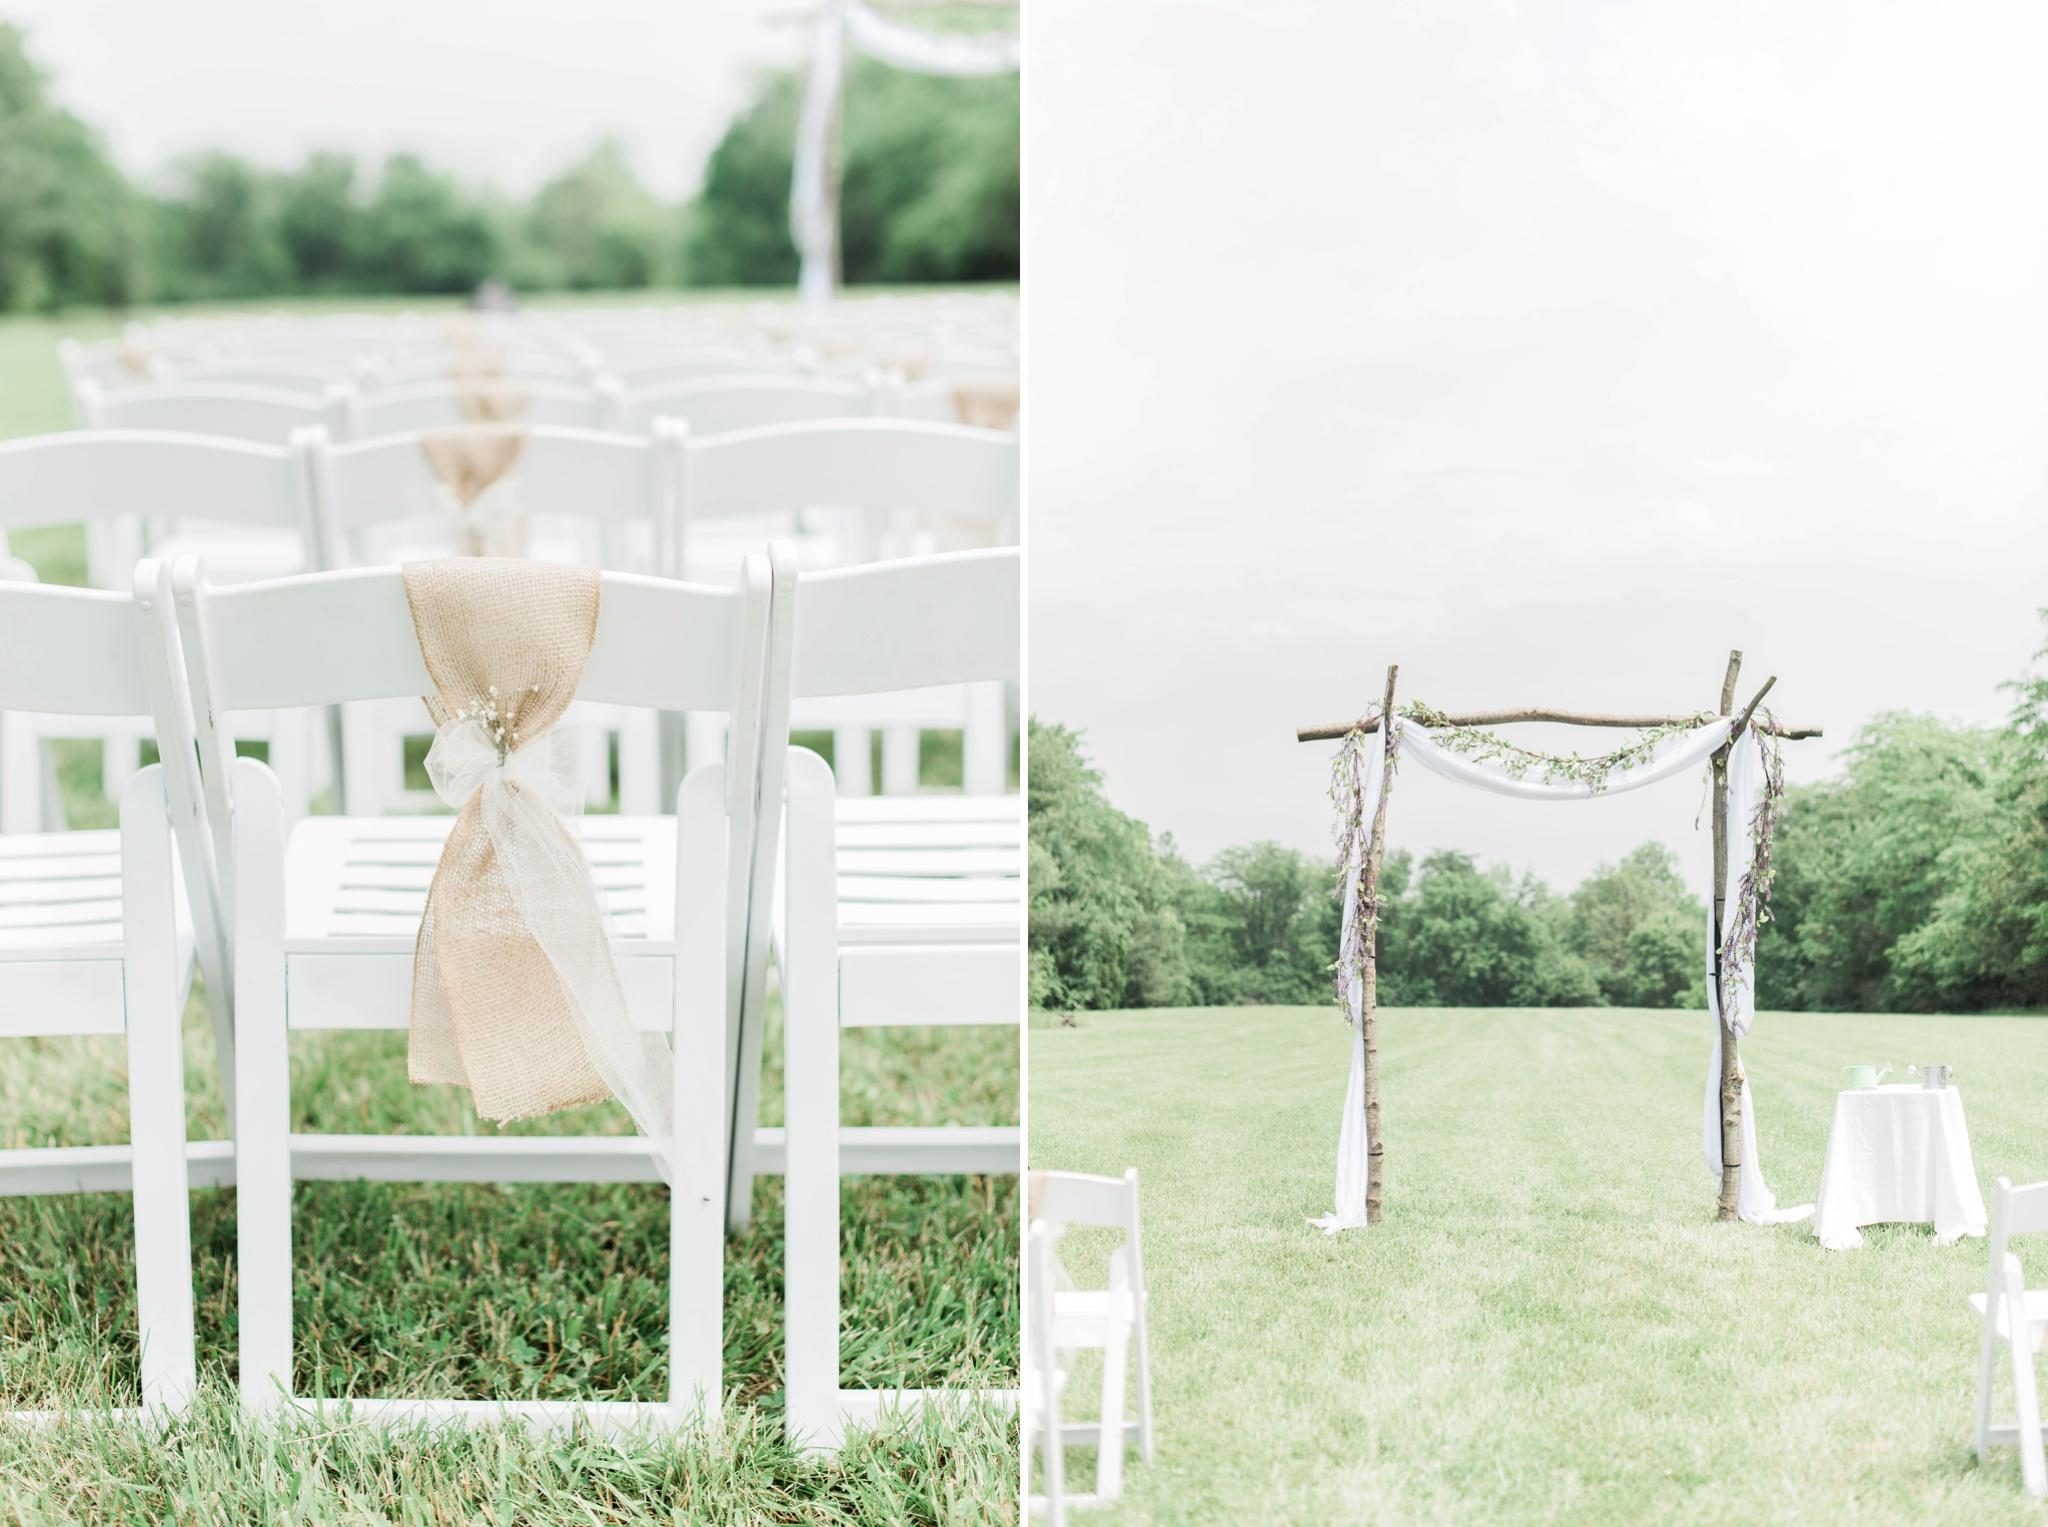 niederman-farm-wedding-cincinnati-ohio-photographer_0051.jpg